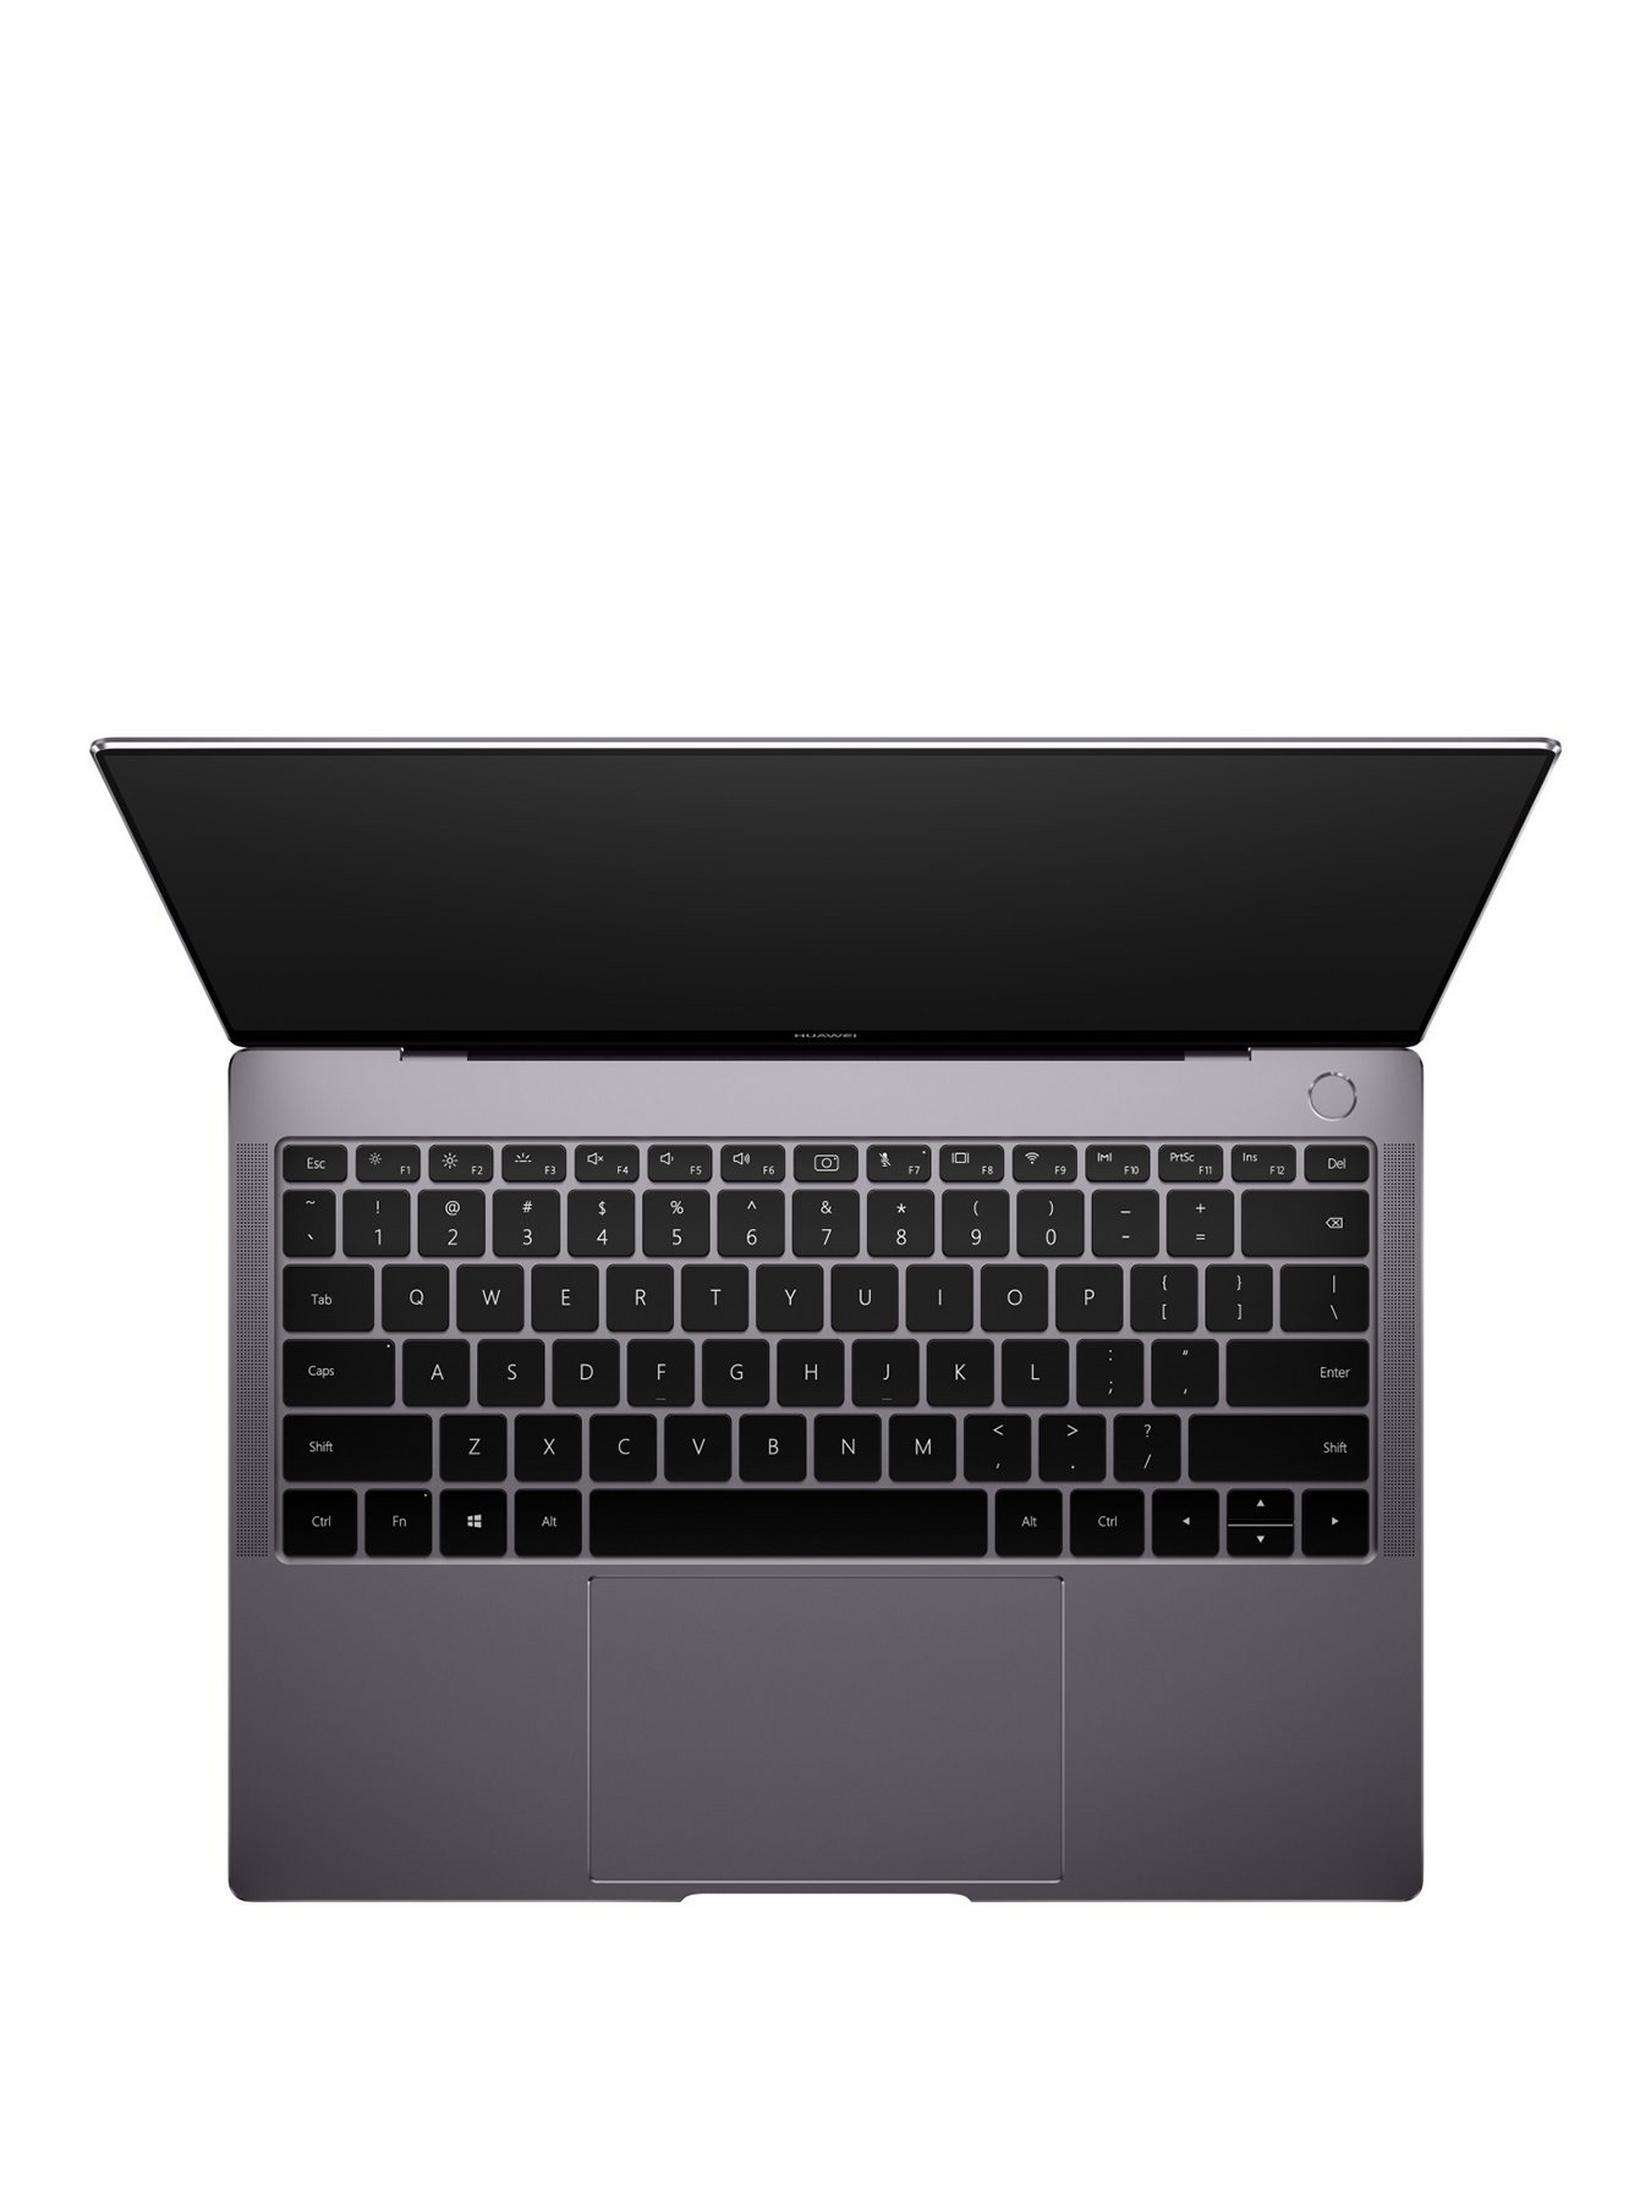 Huawei MateBook X Pro Intel Core i7 16GB RAM 512GB SSD 14in Laptop 1 years 0% credit £1,349.99 Very